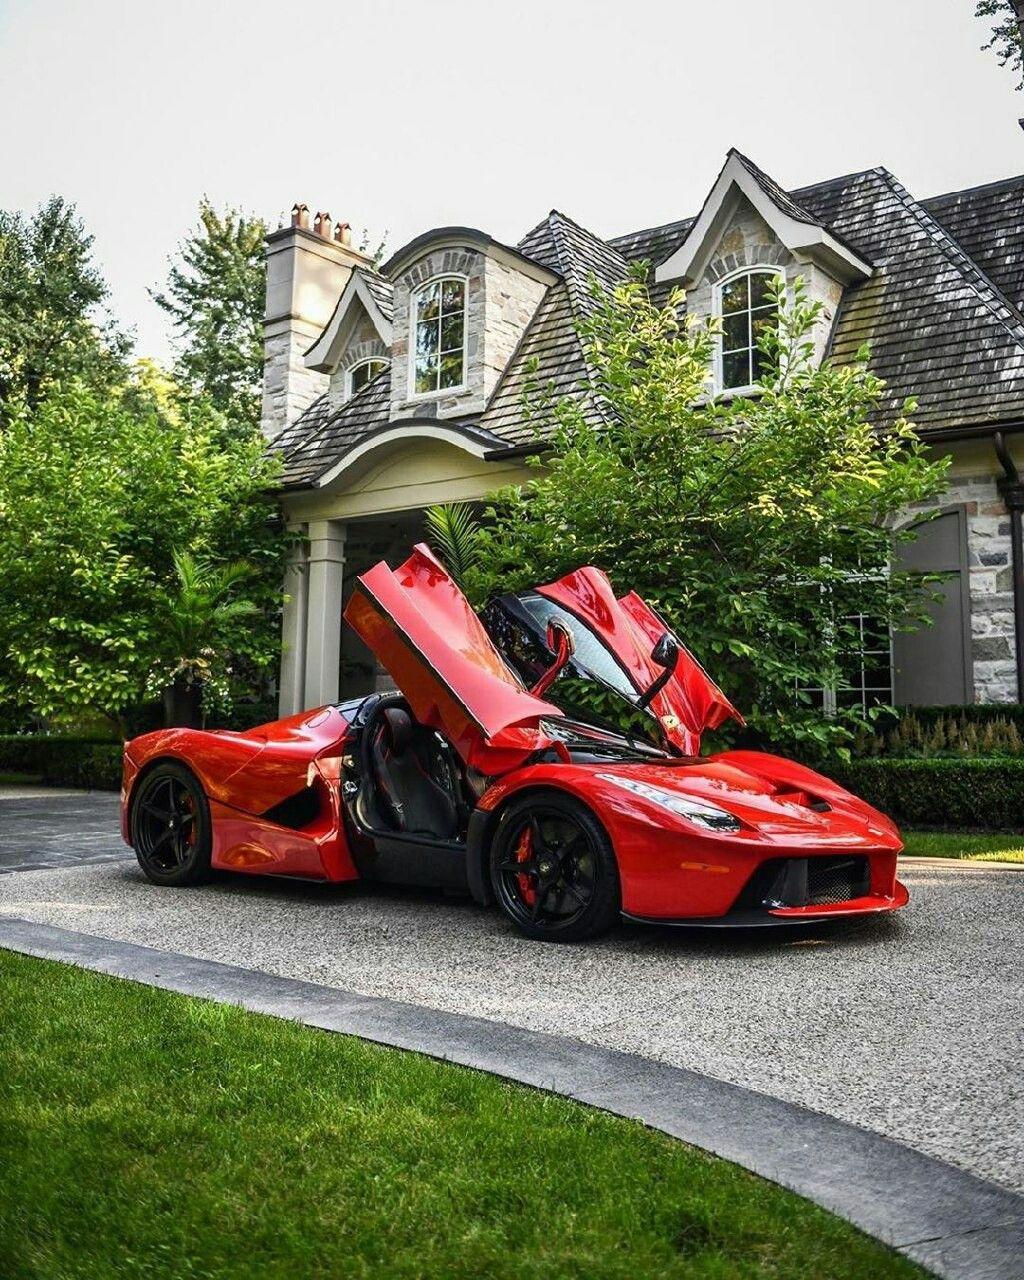 Luxury Lifestyle Car In 2020 Ferrari La Ferrari Super Cars